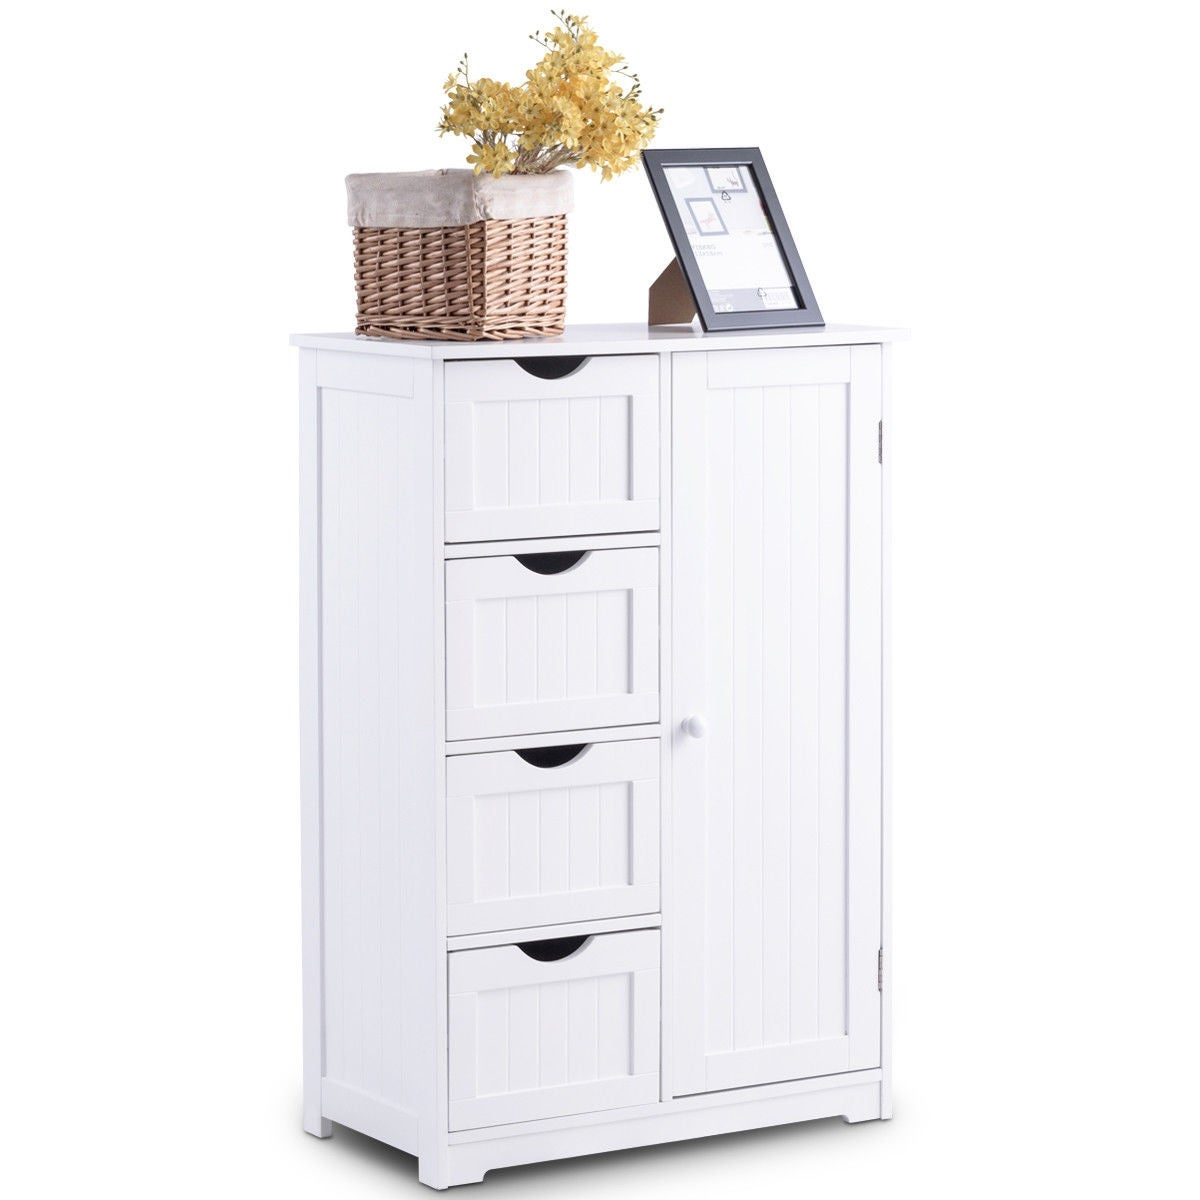 Shop Costway Wooden 4 Drawer Bathroom Cabinet Storage Cupboard 2 ...